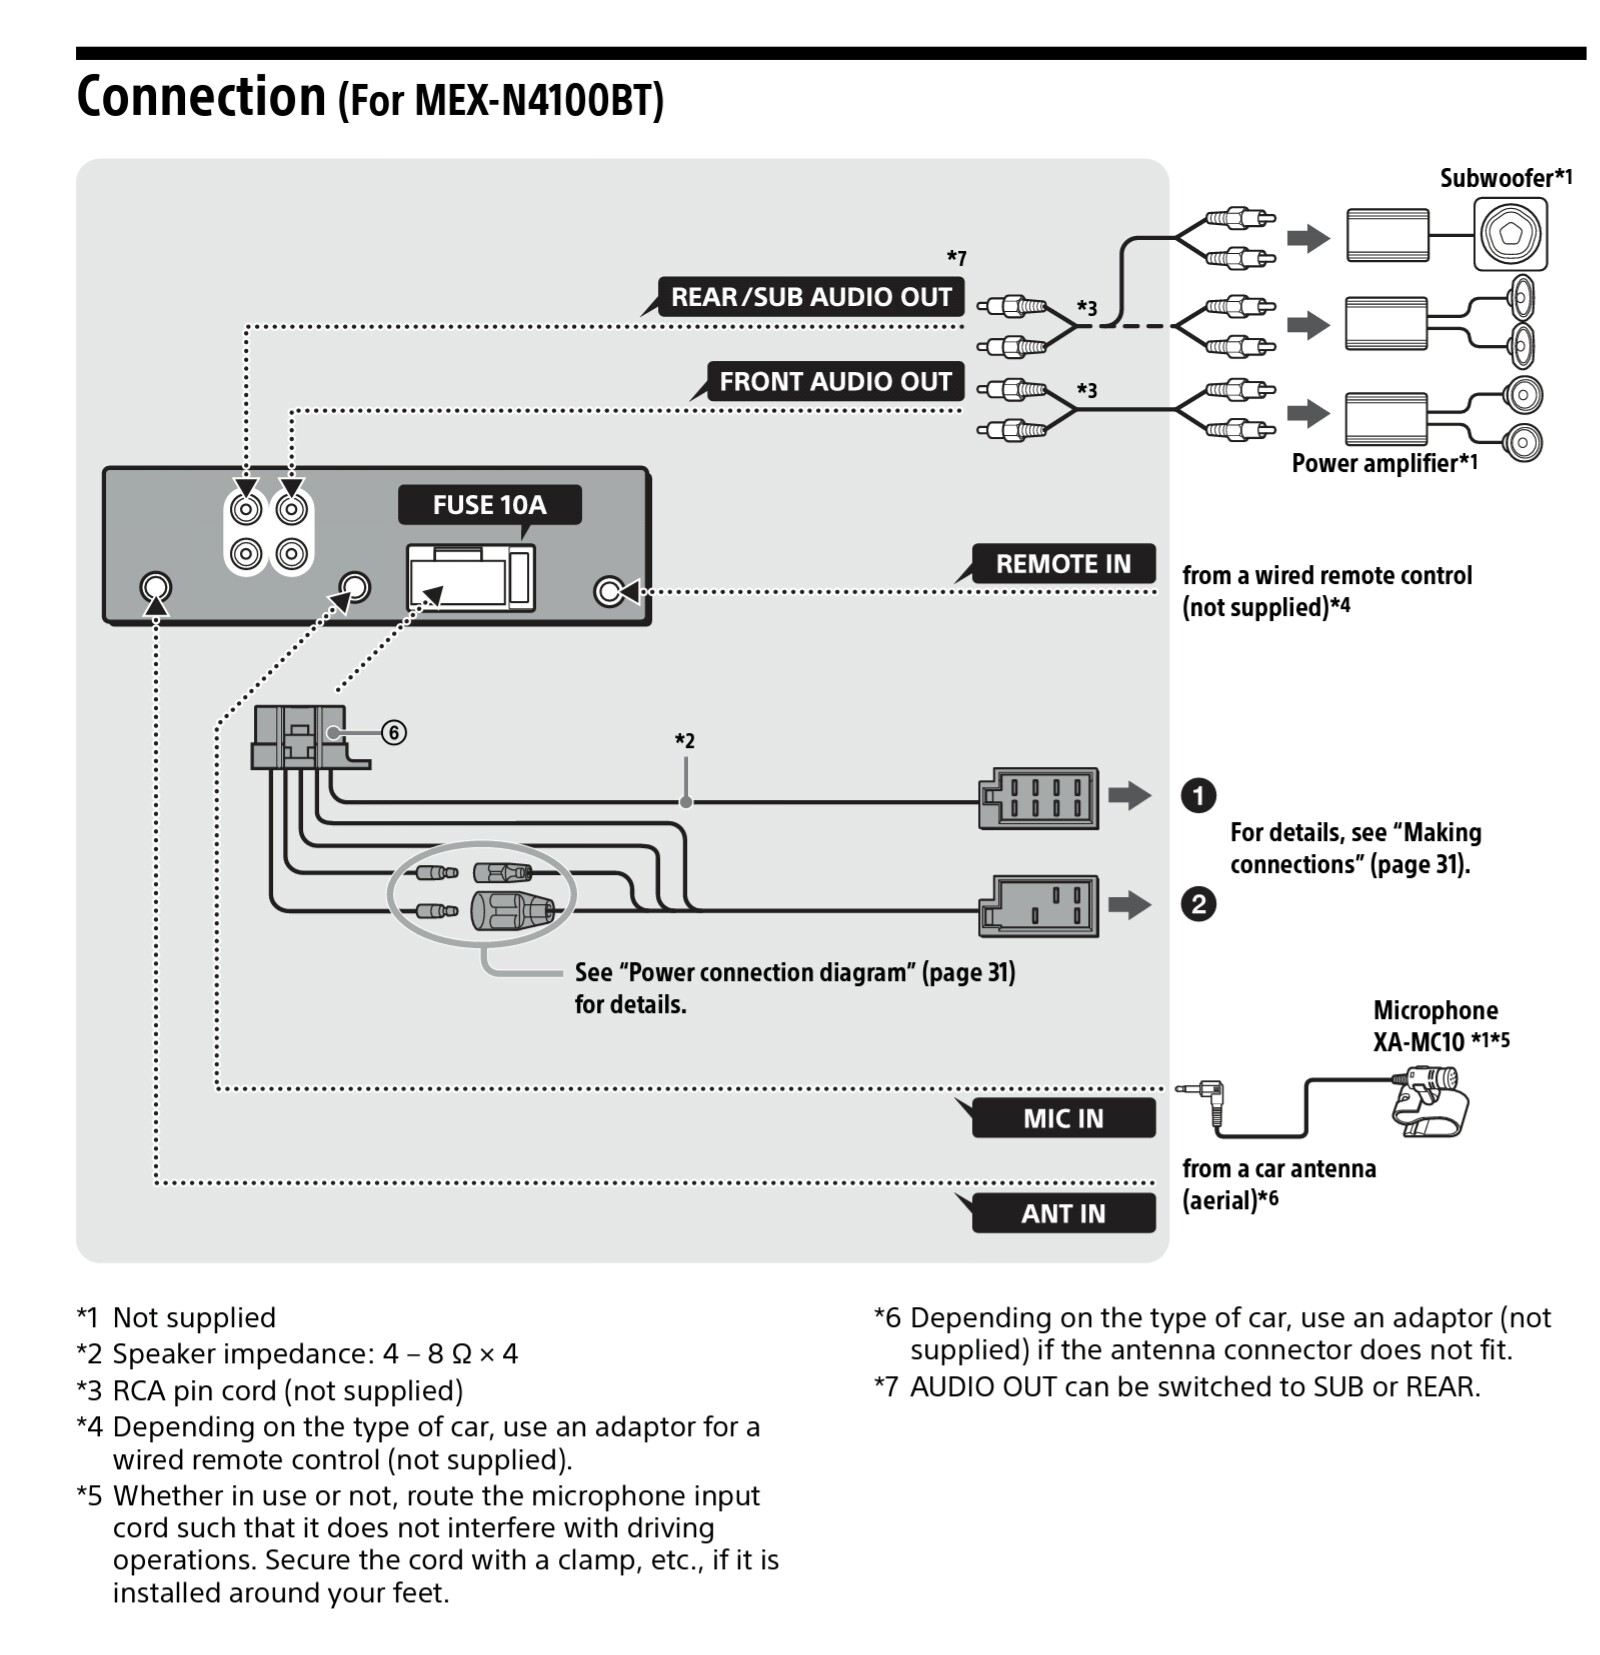 299363iB3119DDF64DB1560?v=1.0 mex n4100bt car radio pre outs switchable query sony sony mex n4100bt wiring diagram at fashall.co